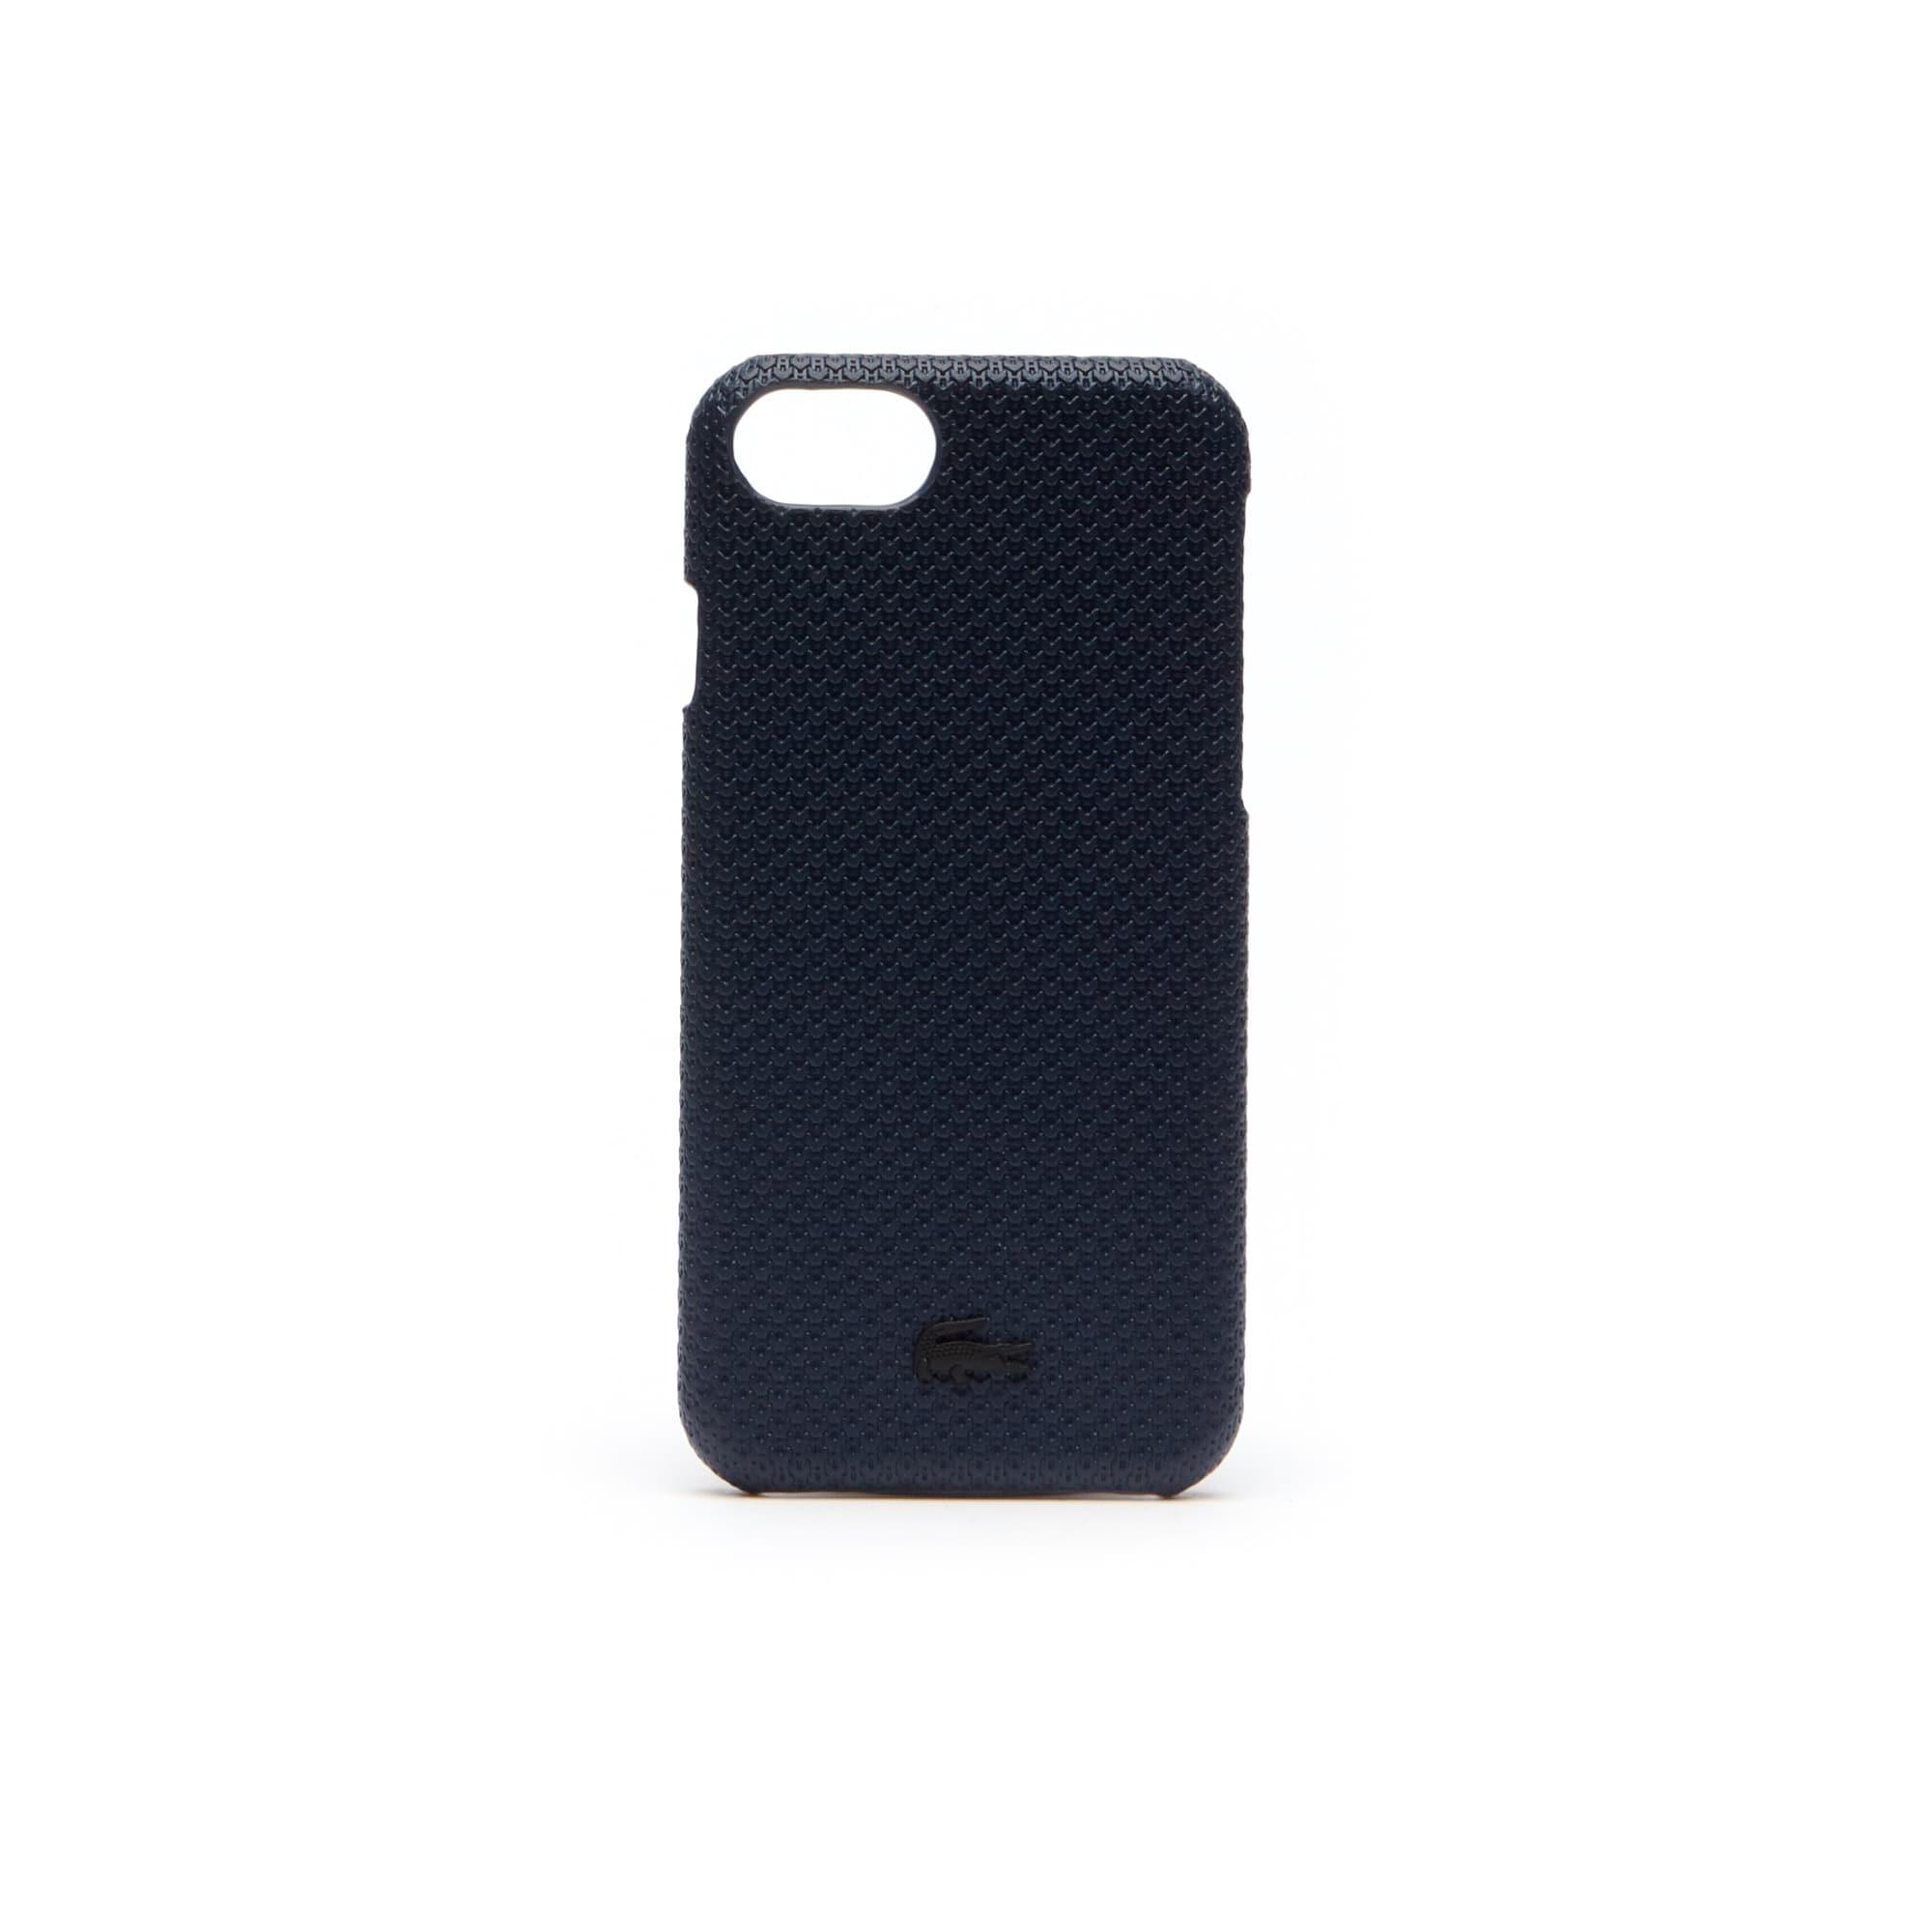 Capa para iPhone 8 Chantaco em pele piqué mate